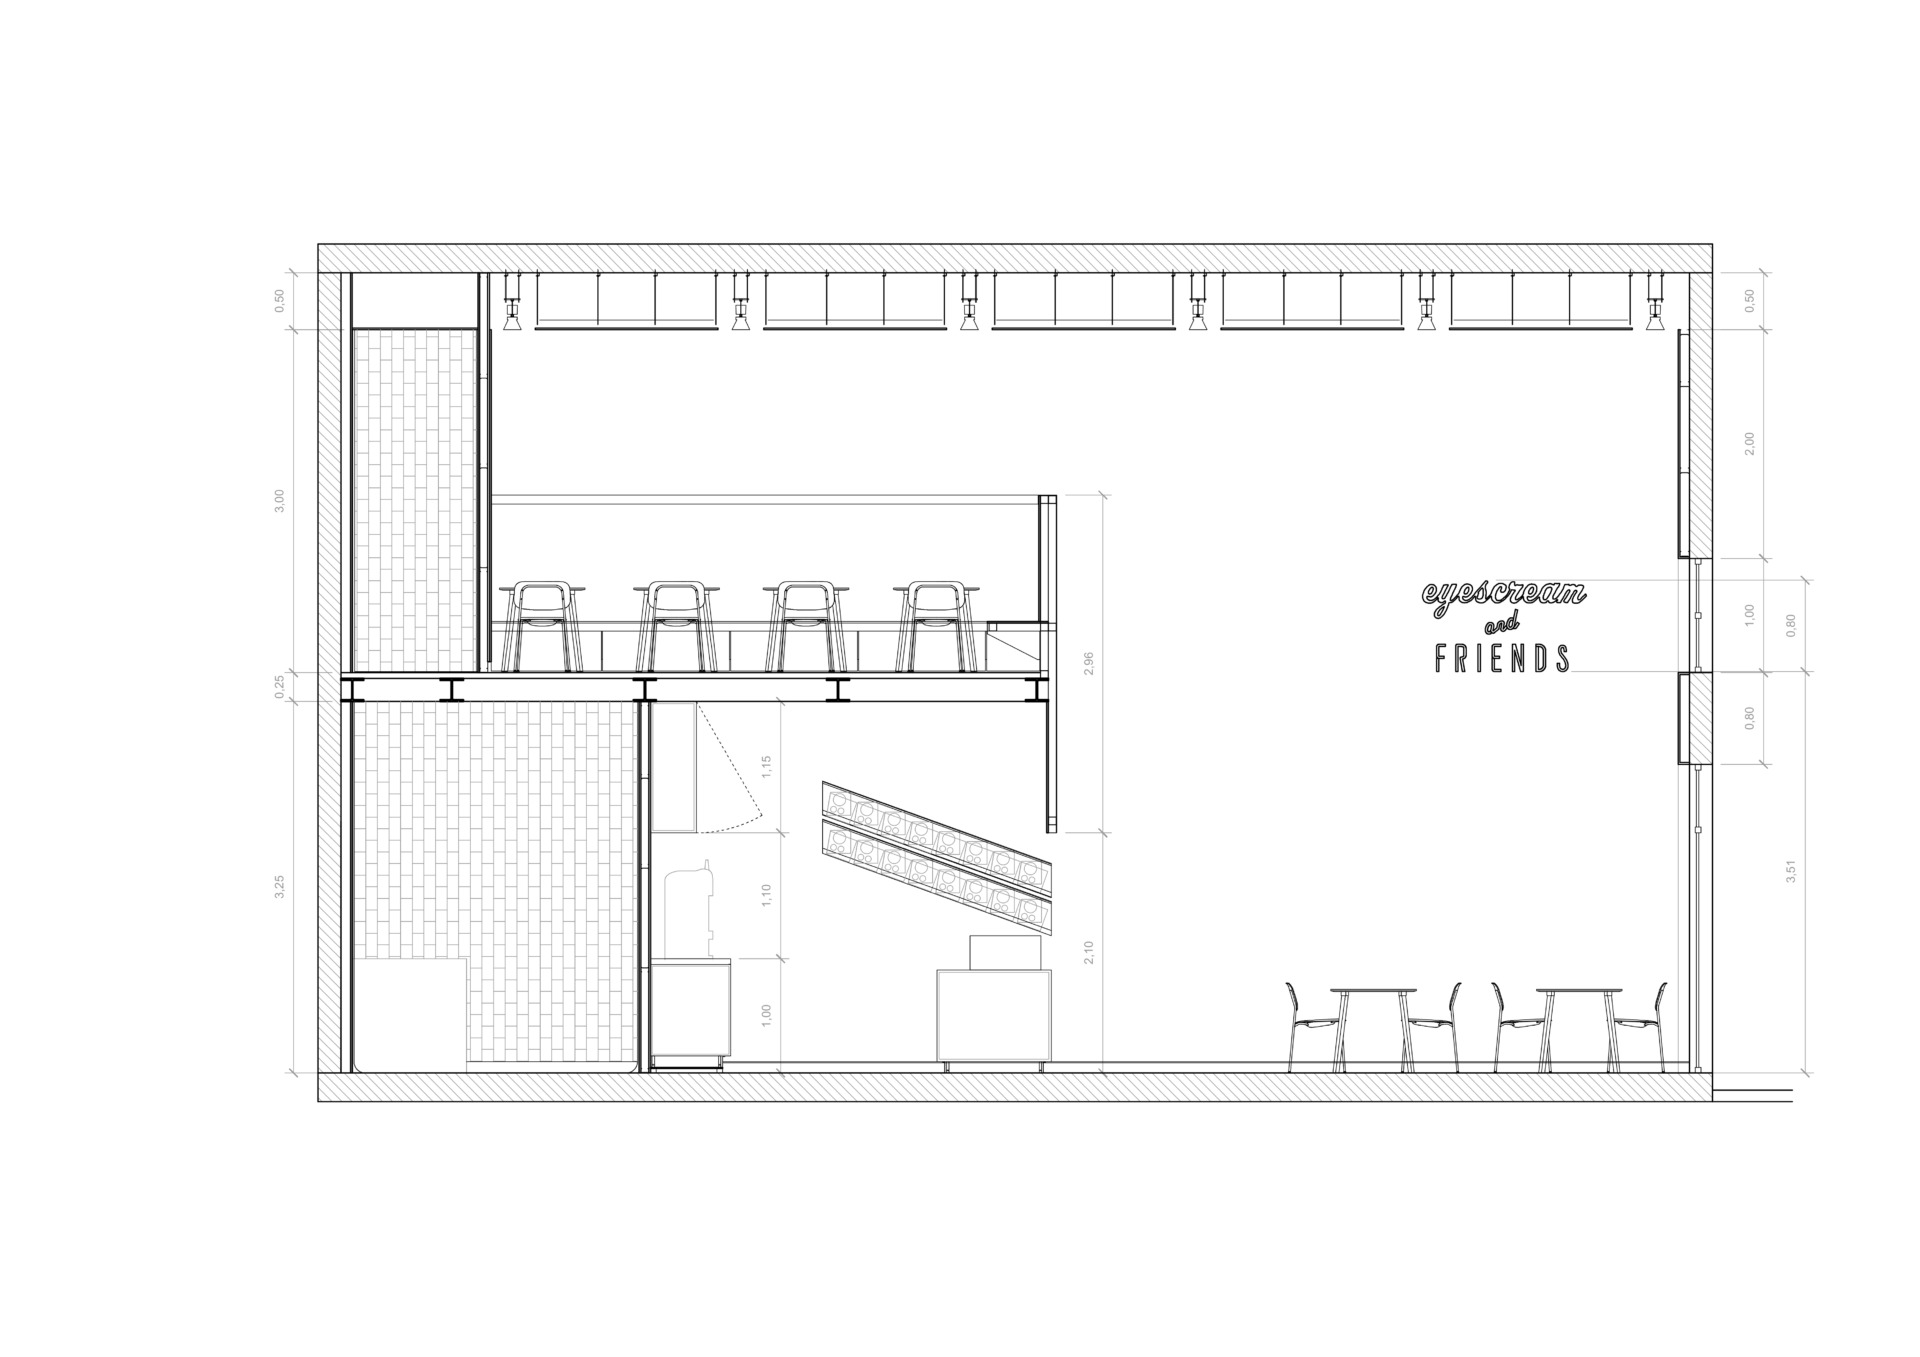 Sala Ferusic Architects Frozen Bahrain Carles Sala Relja Ferusic